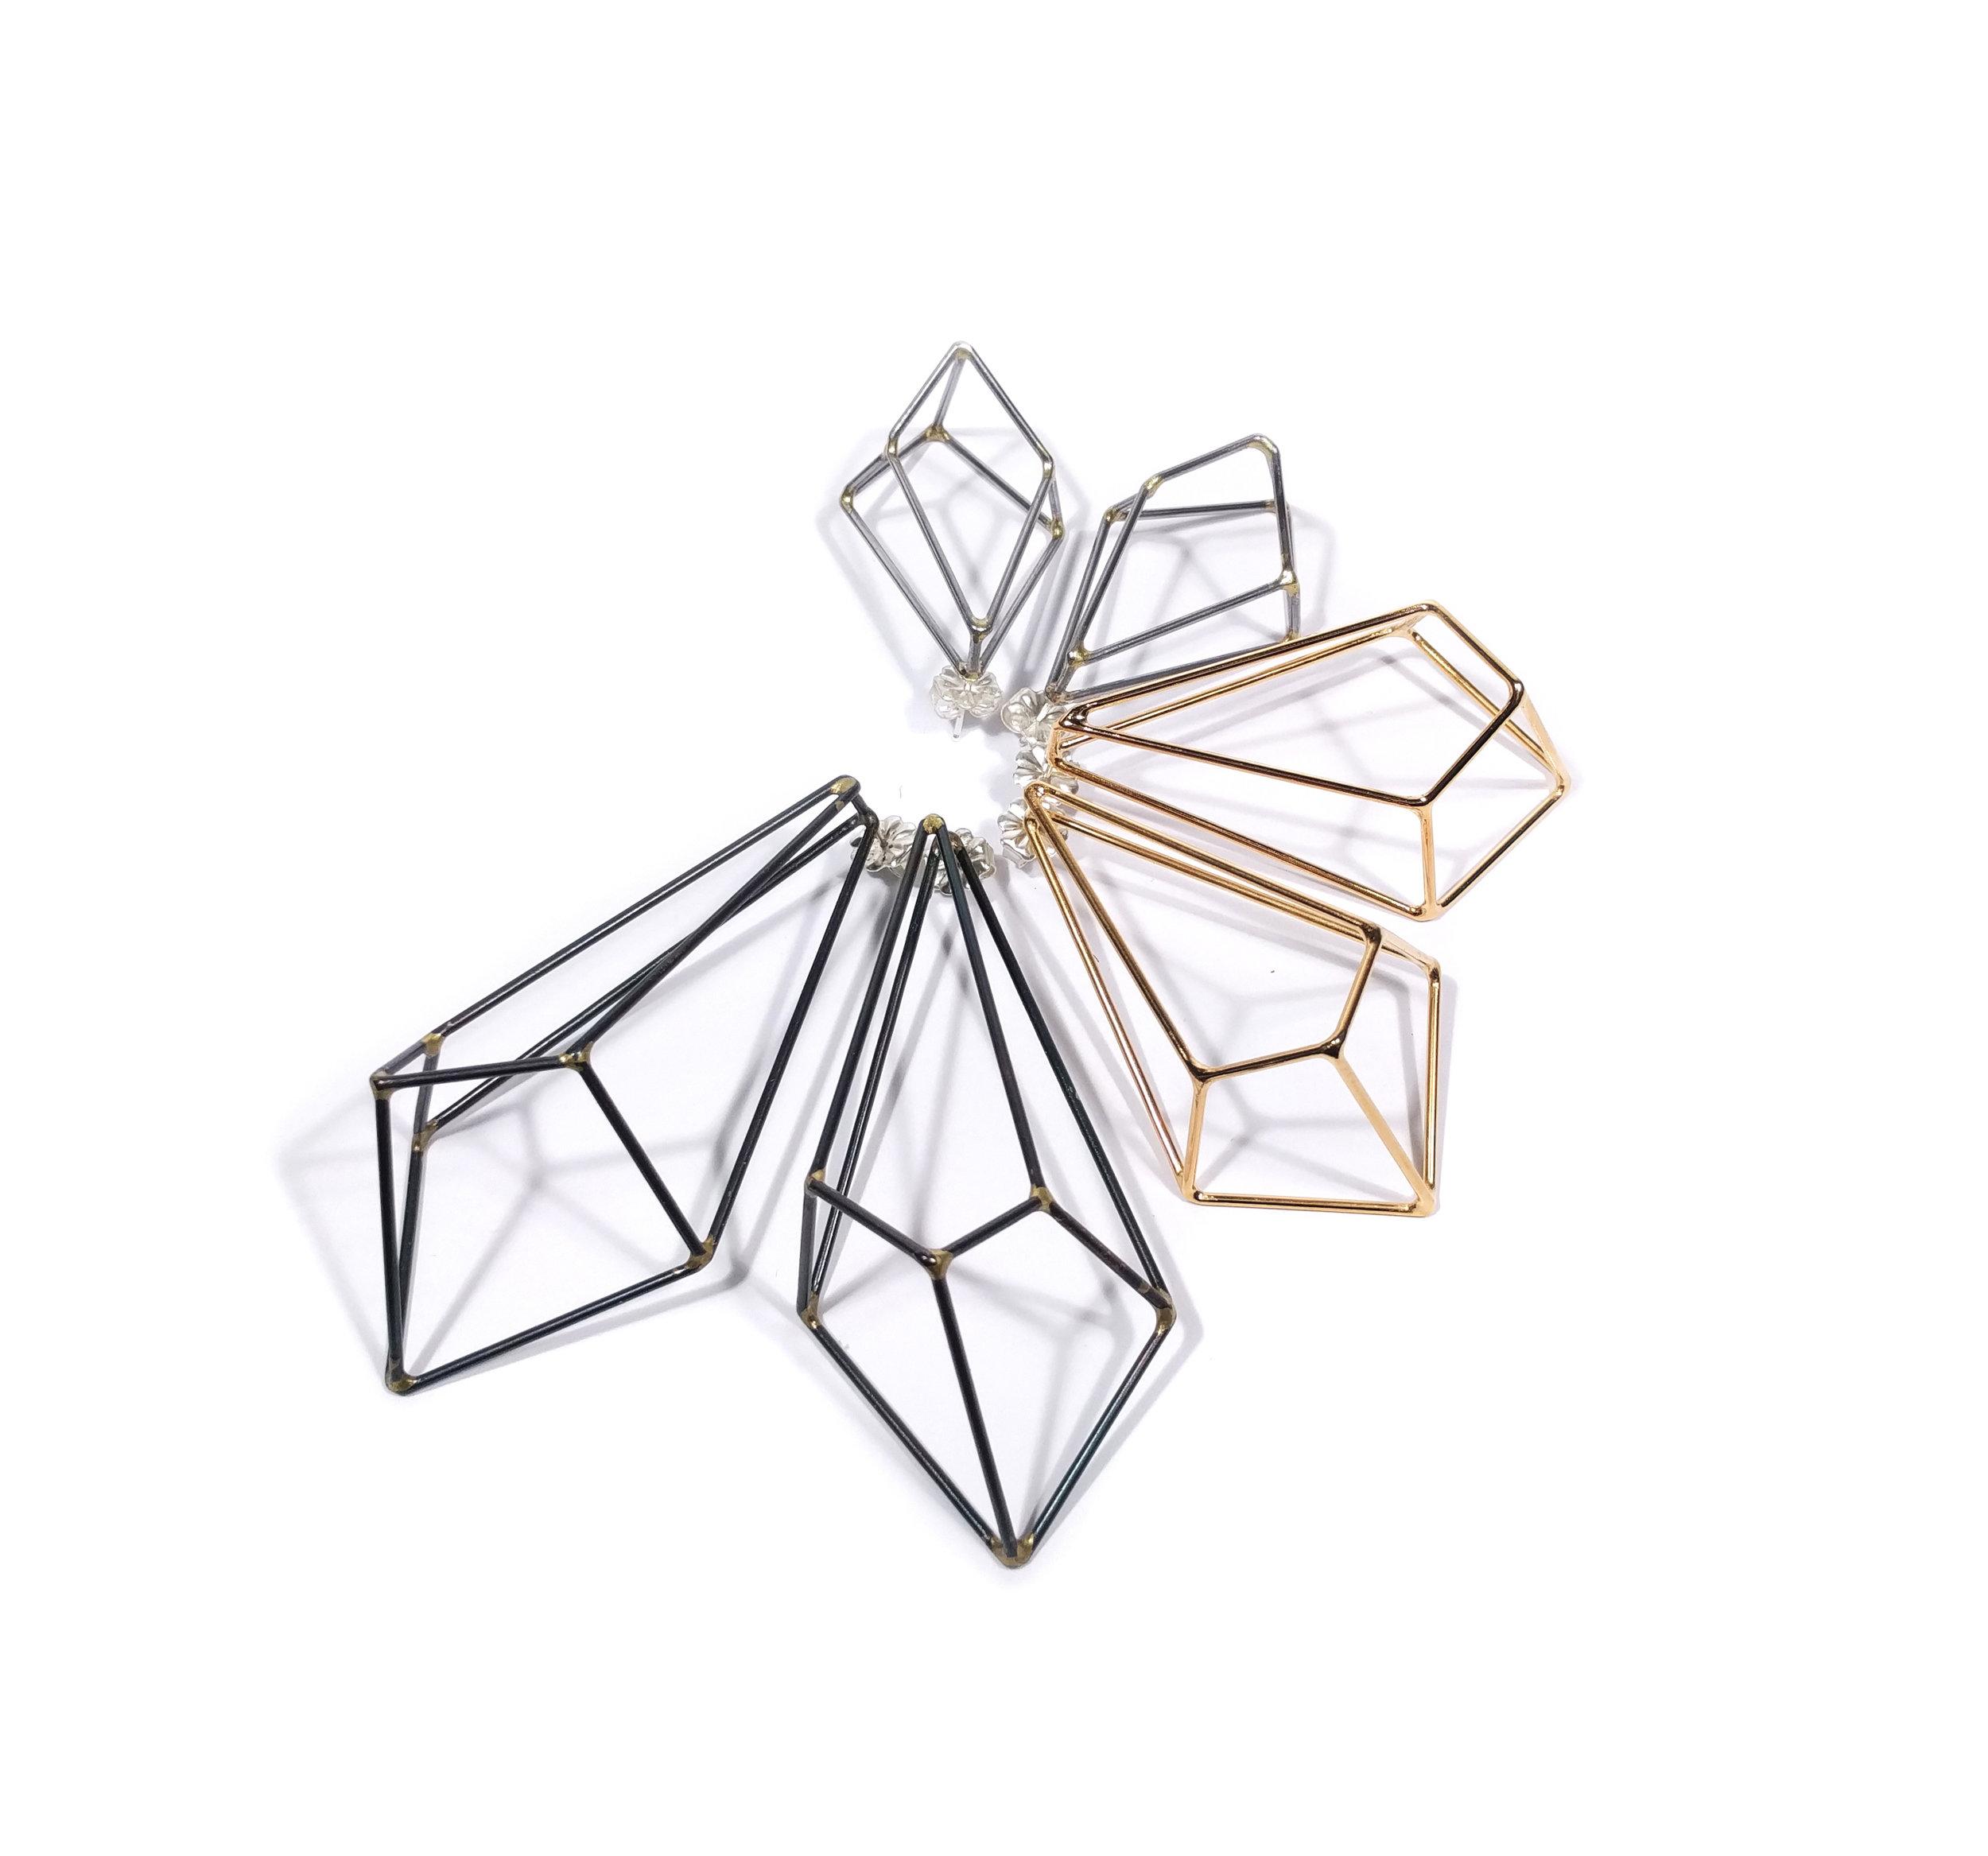 Crystalline Construction Earrings